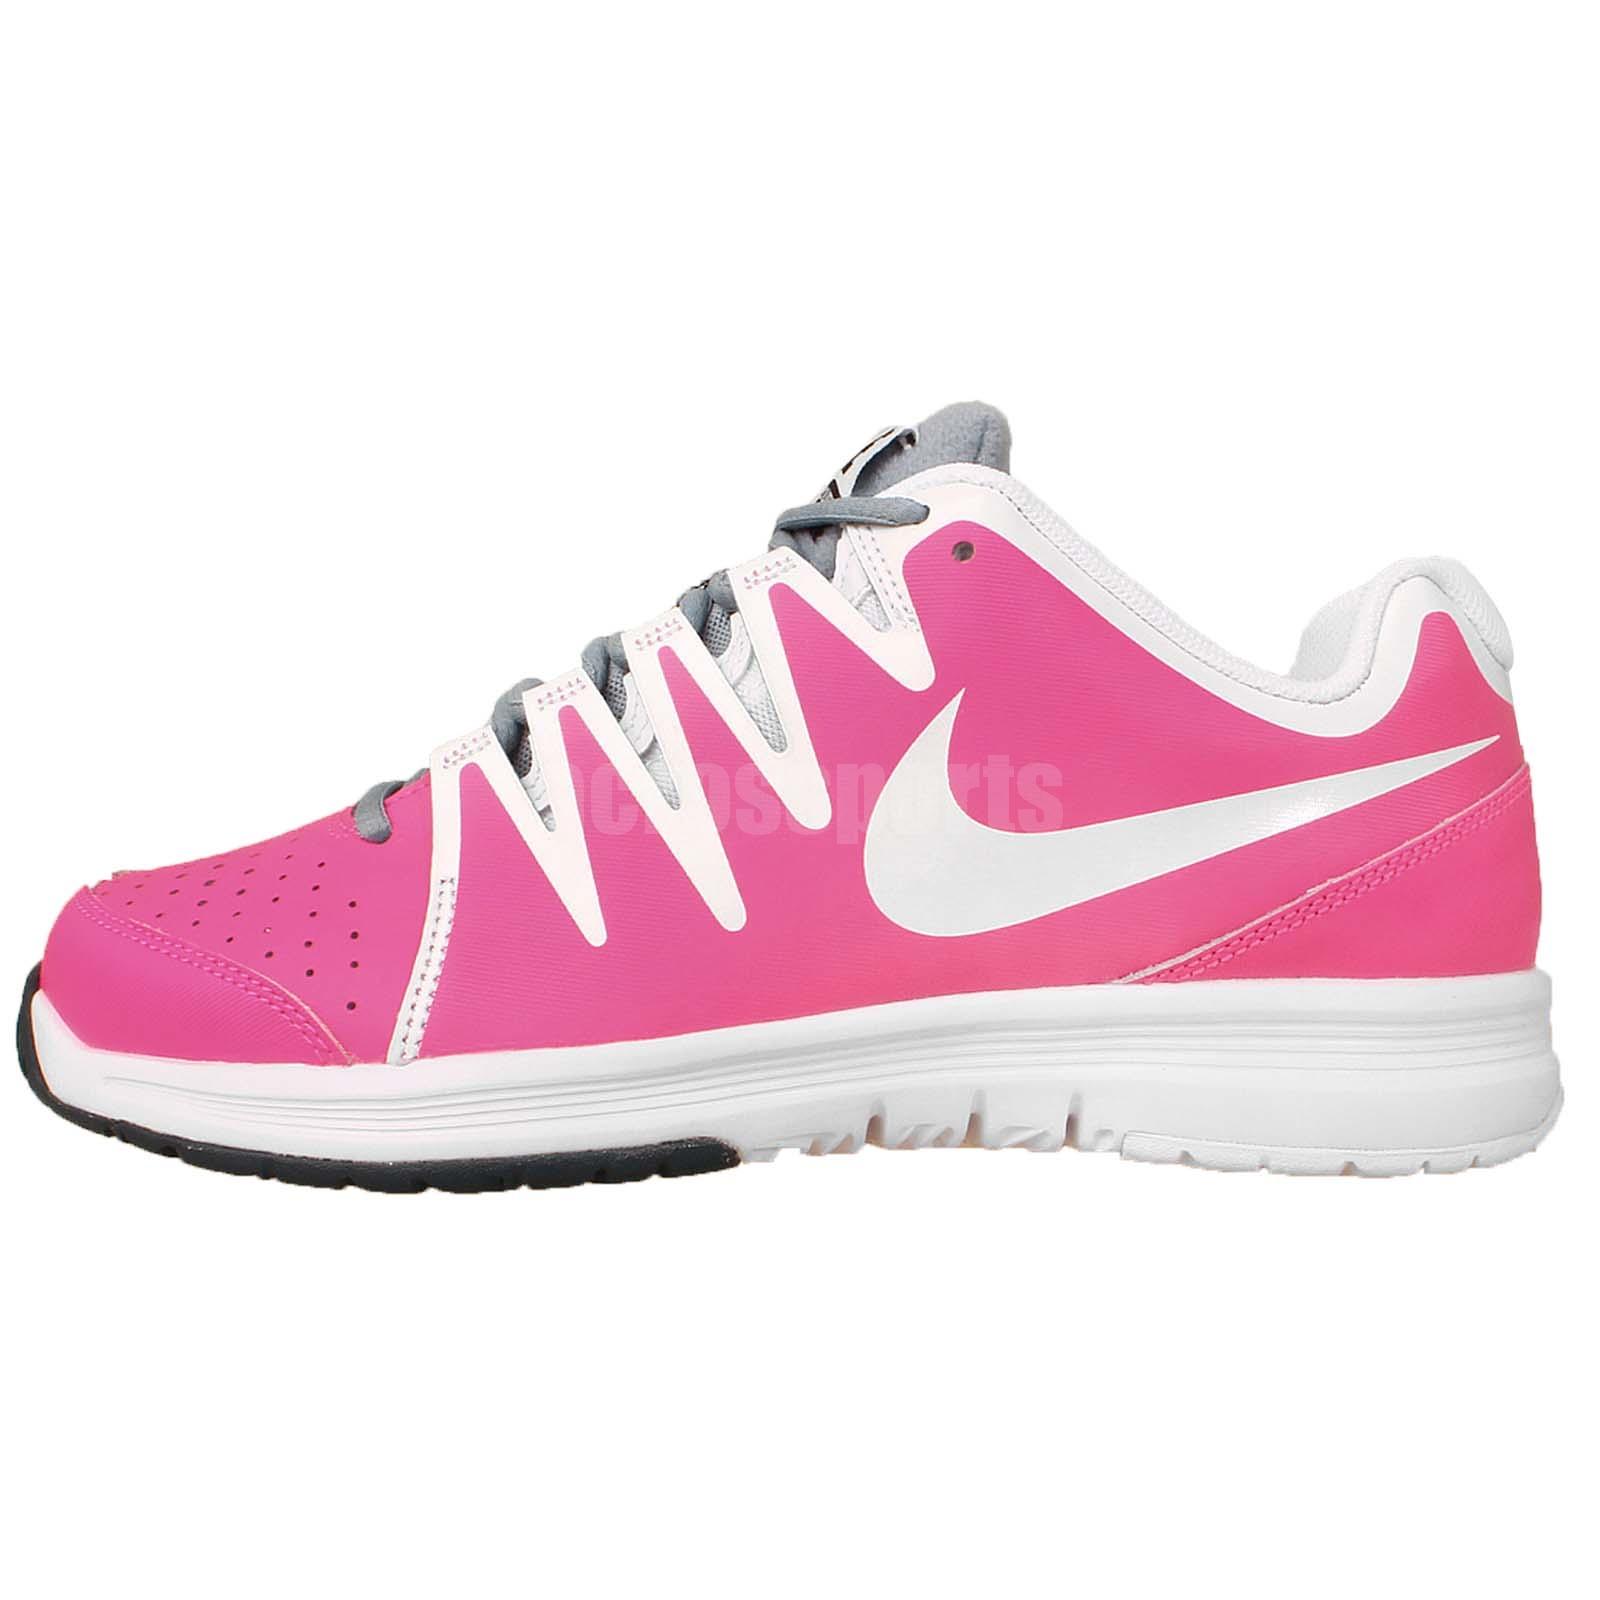 nike wmns vapor court pink white 2015 new womens tennis